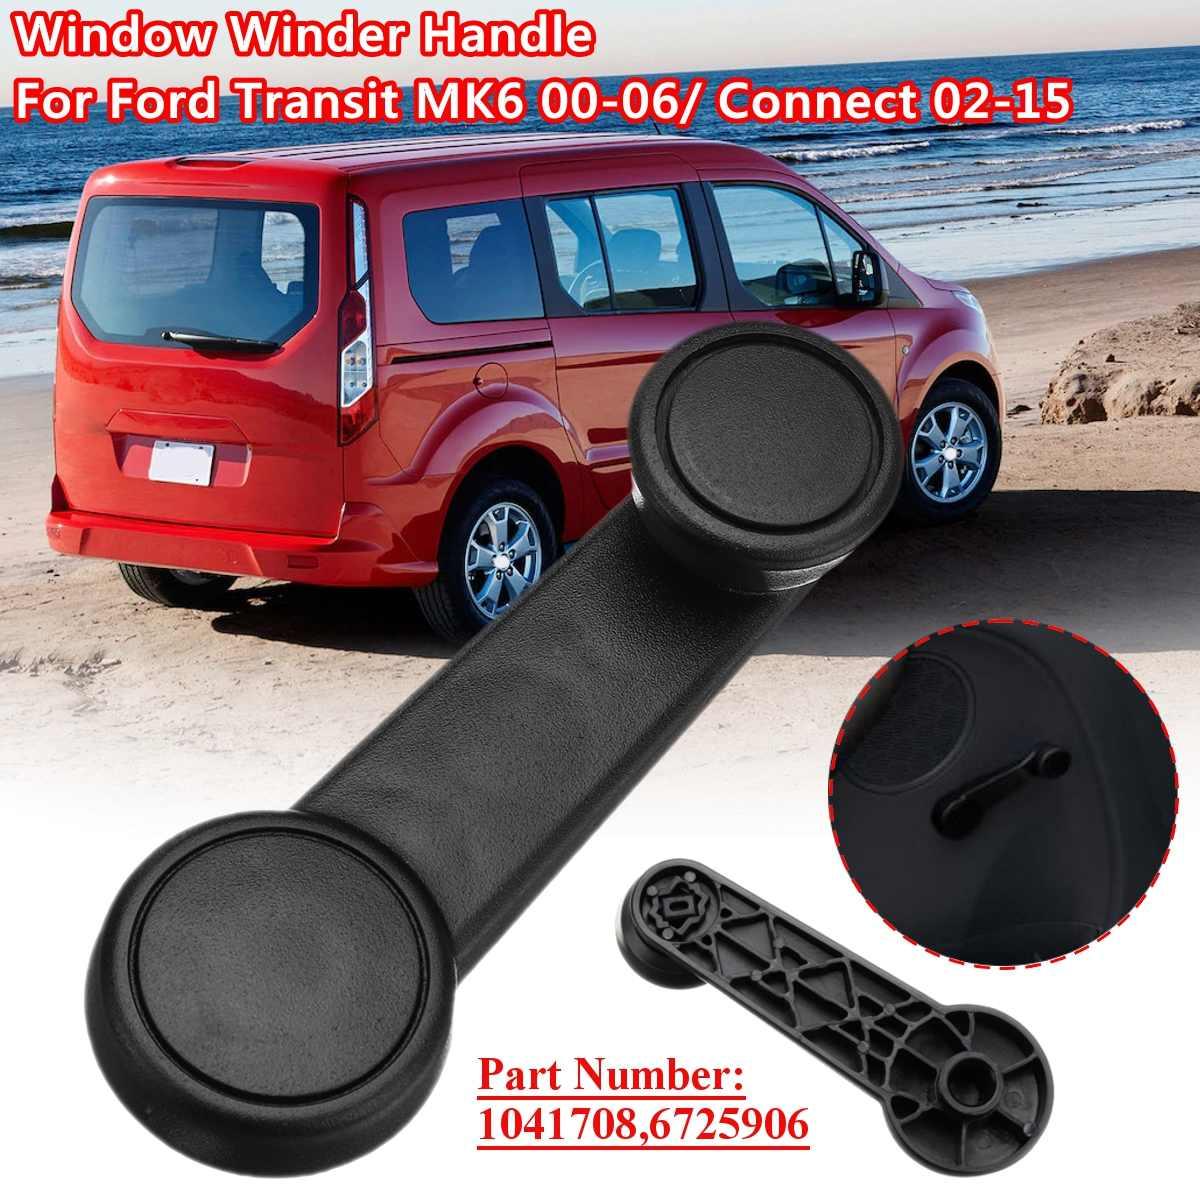 2pcs Car Window Regulator Handle For Ford Transit MK6 00-06 Connect 2002-2015 1041708 6725906 95VB-V23342-ABYYCT